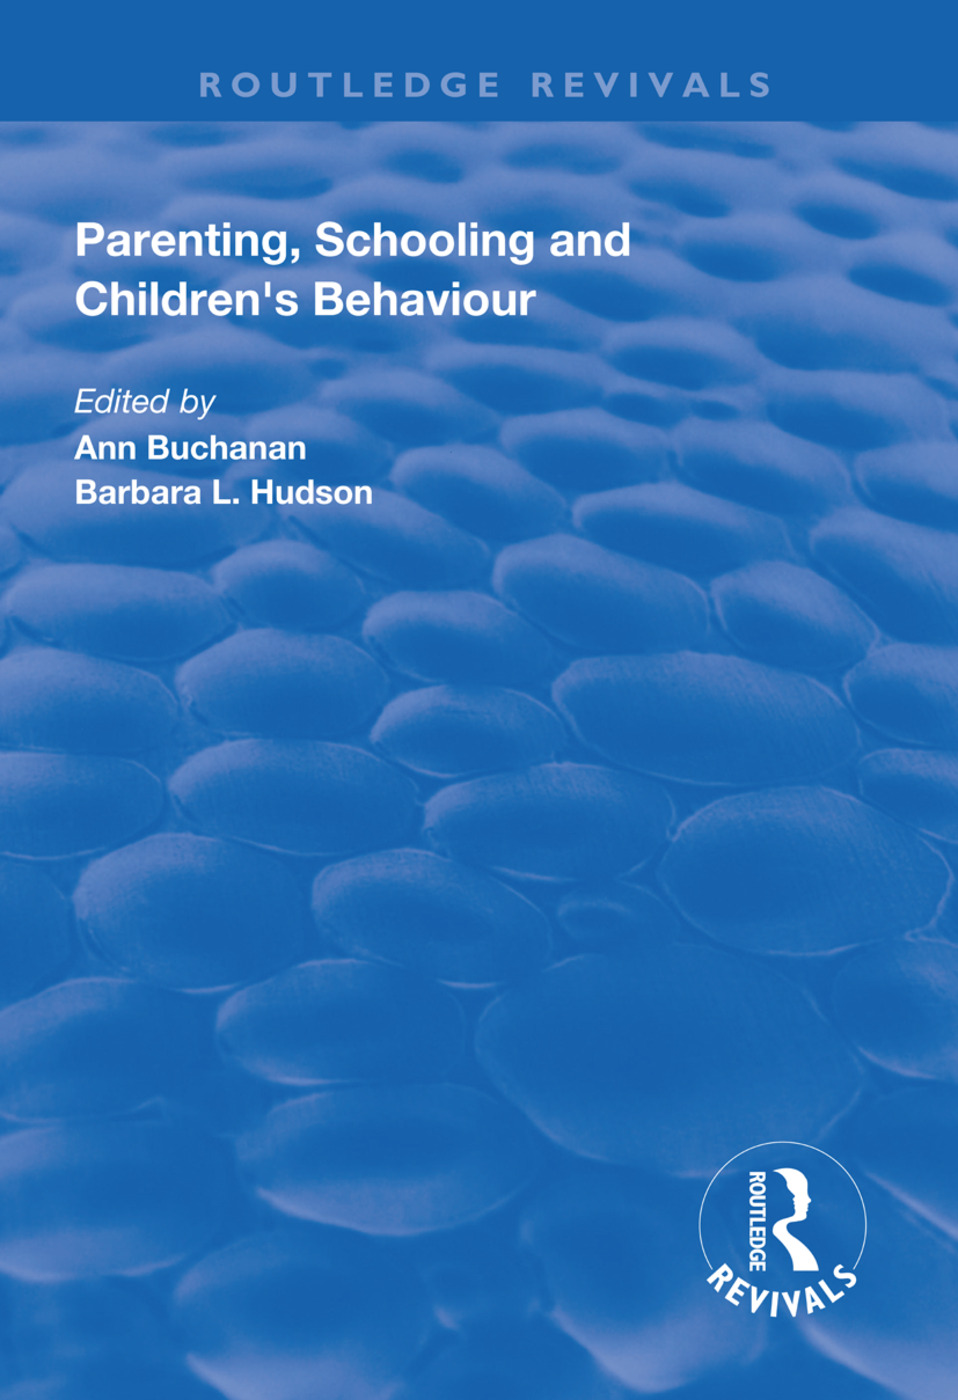 Parenting, Schooling and Children's Behaviour